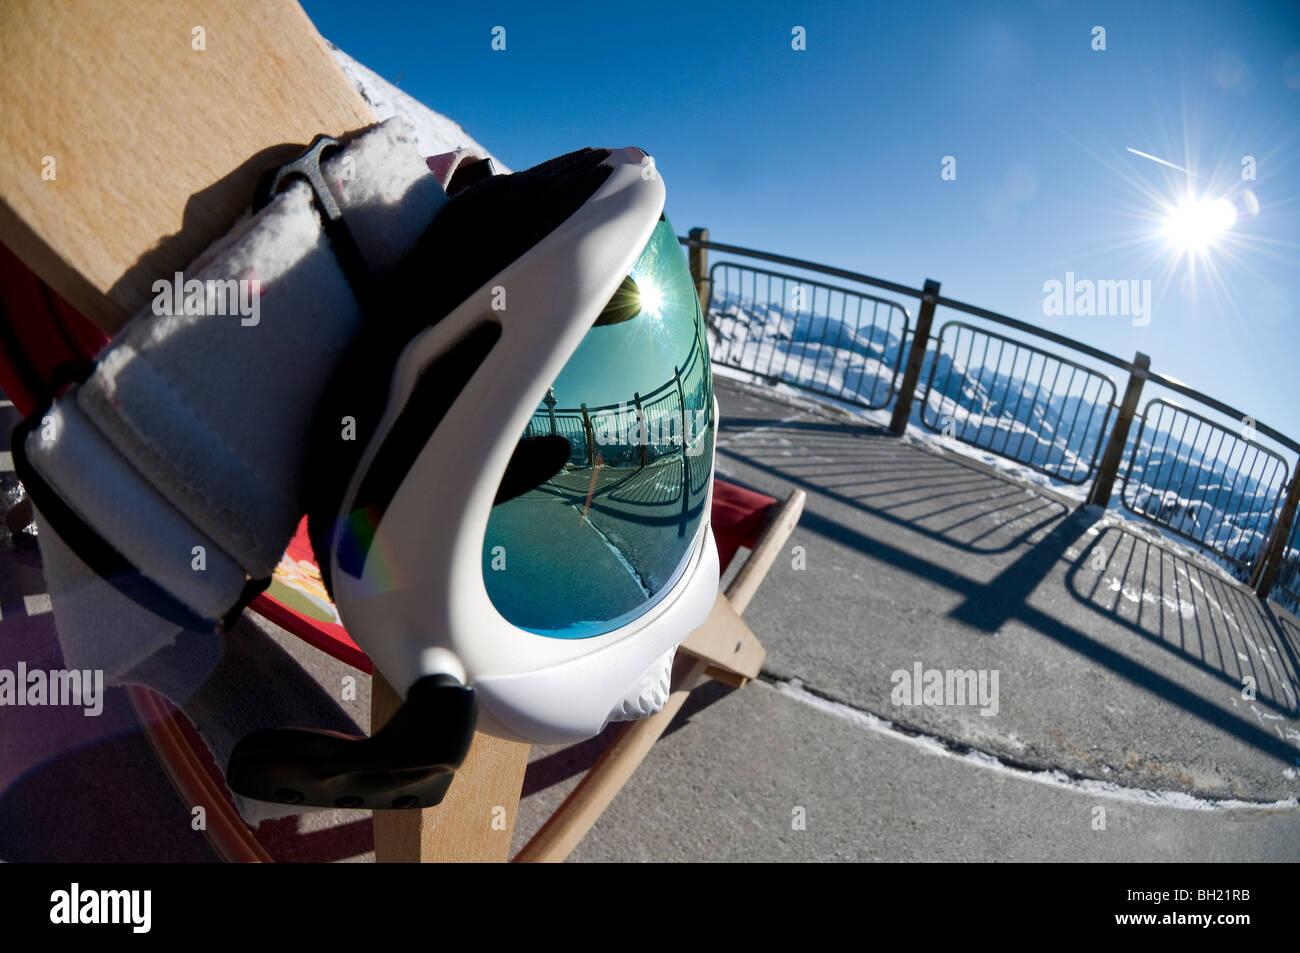 Skiing Goggles Hanging On Deck Chair, Kitzbuhel, Austria